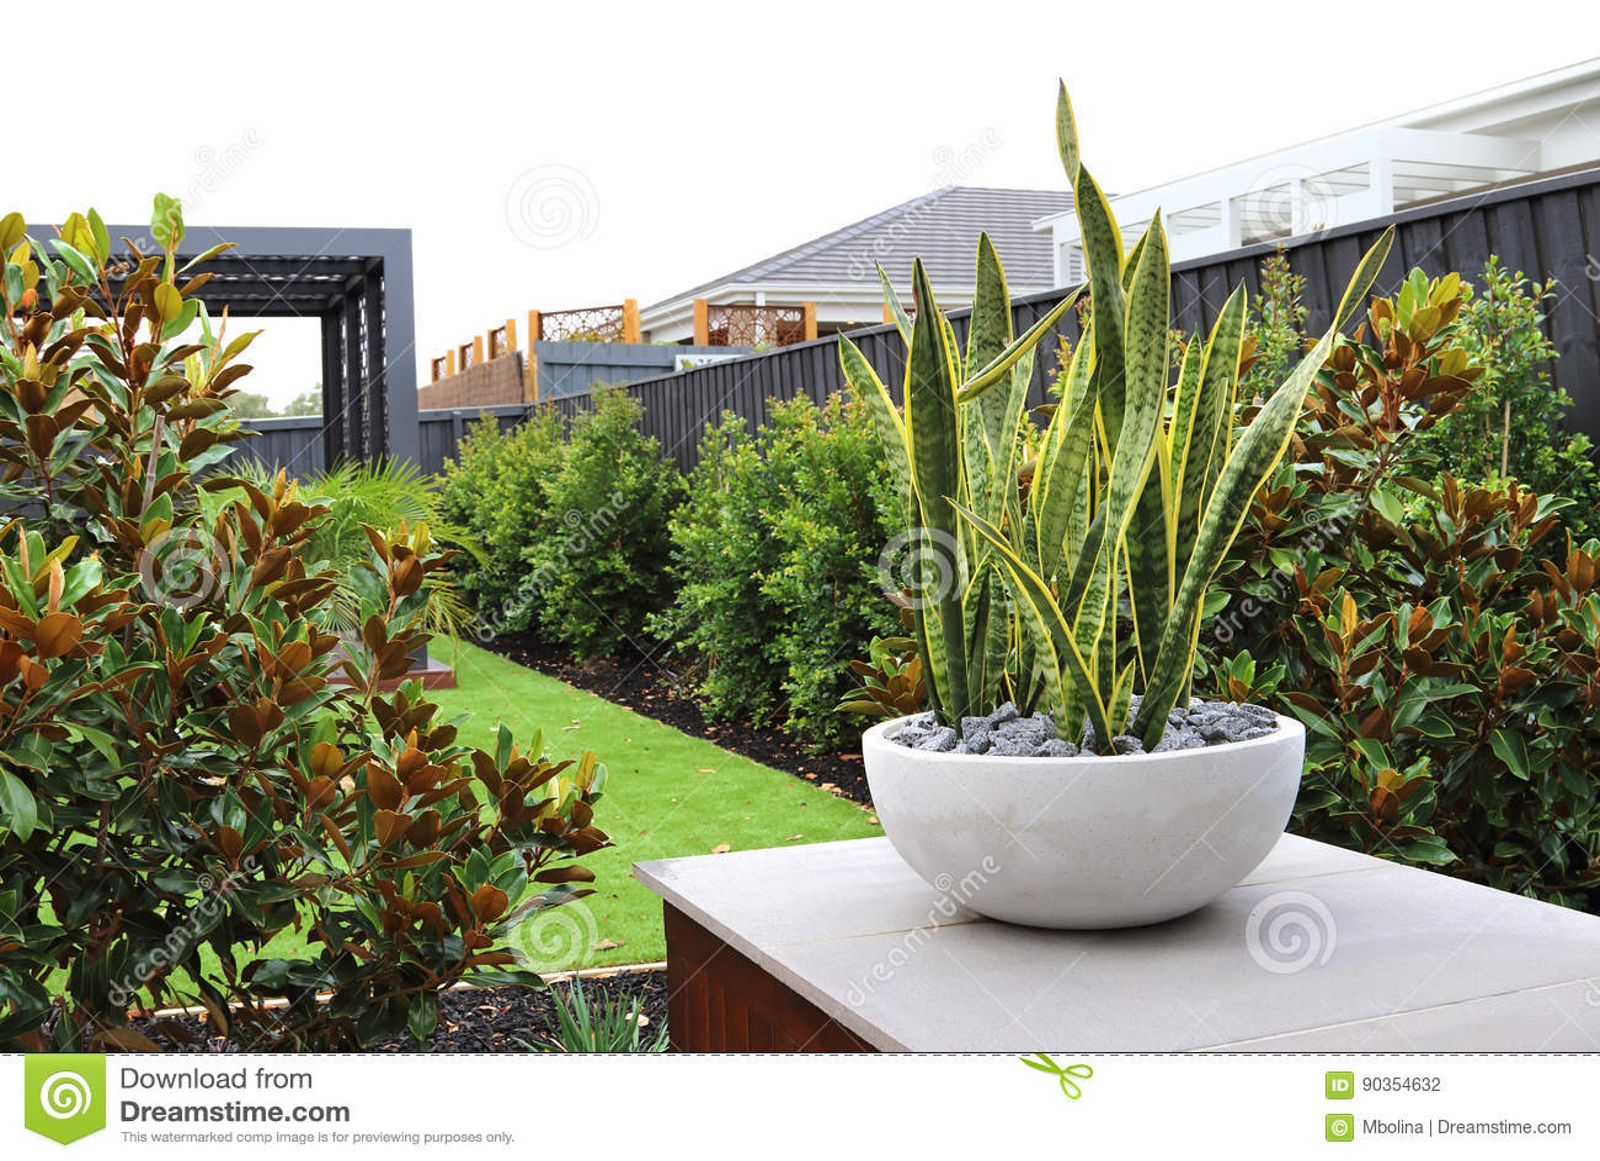 Modern Backyard Design Ideas Stock Photo - Image of ...